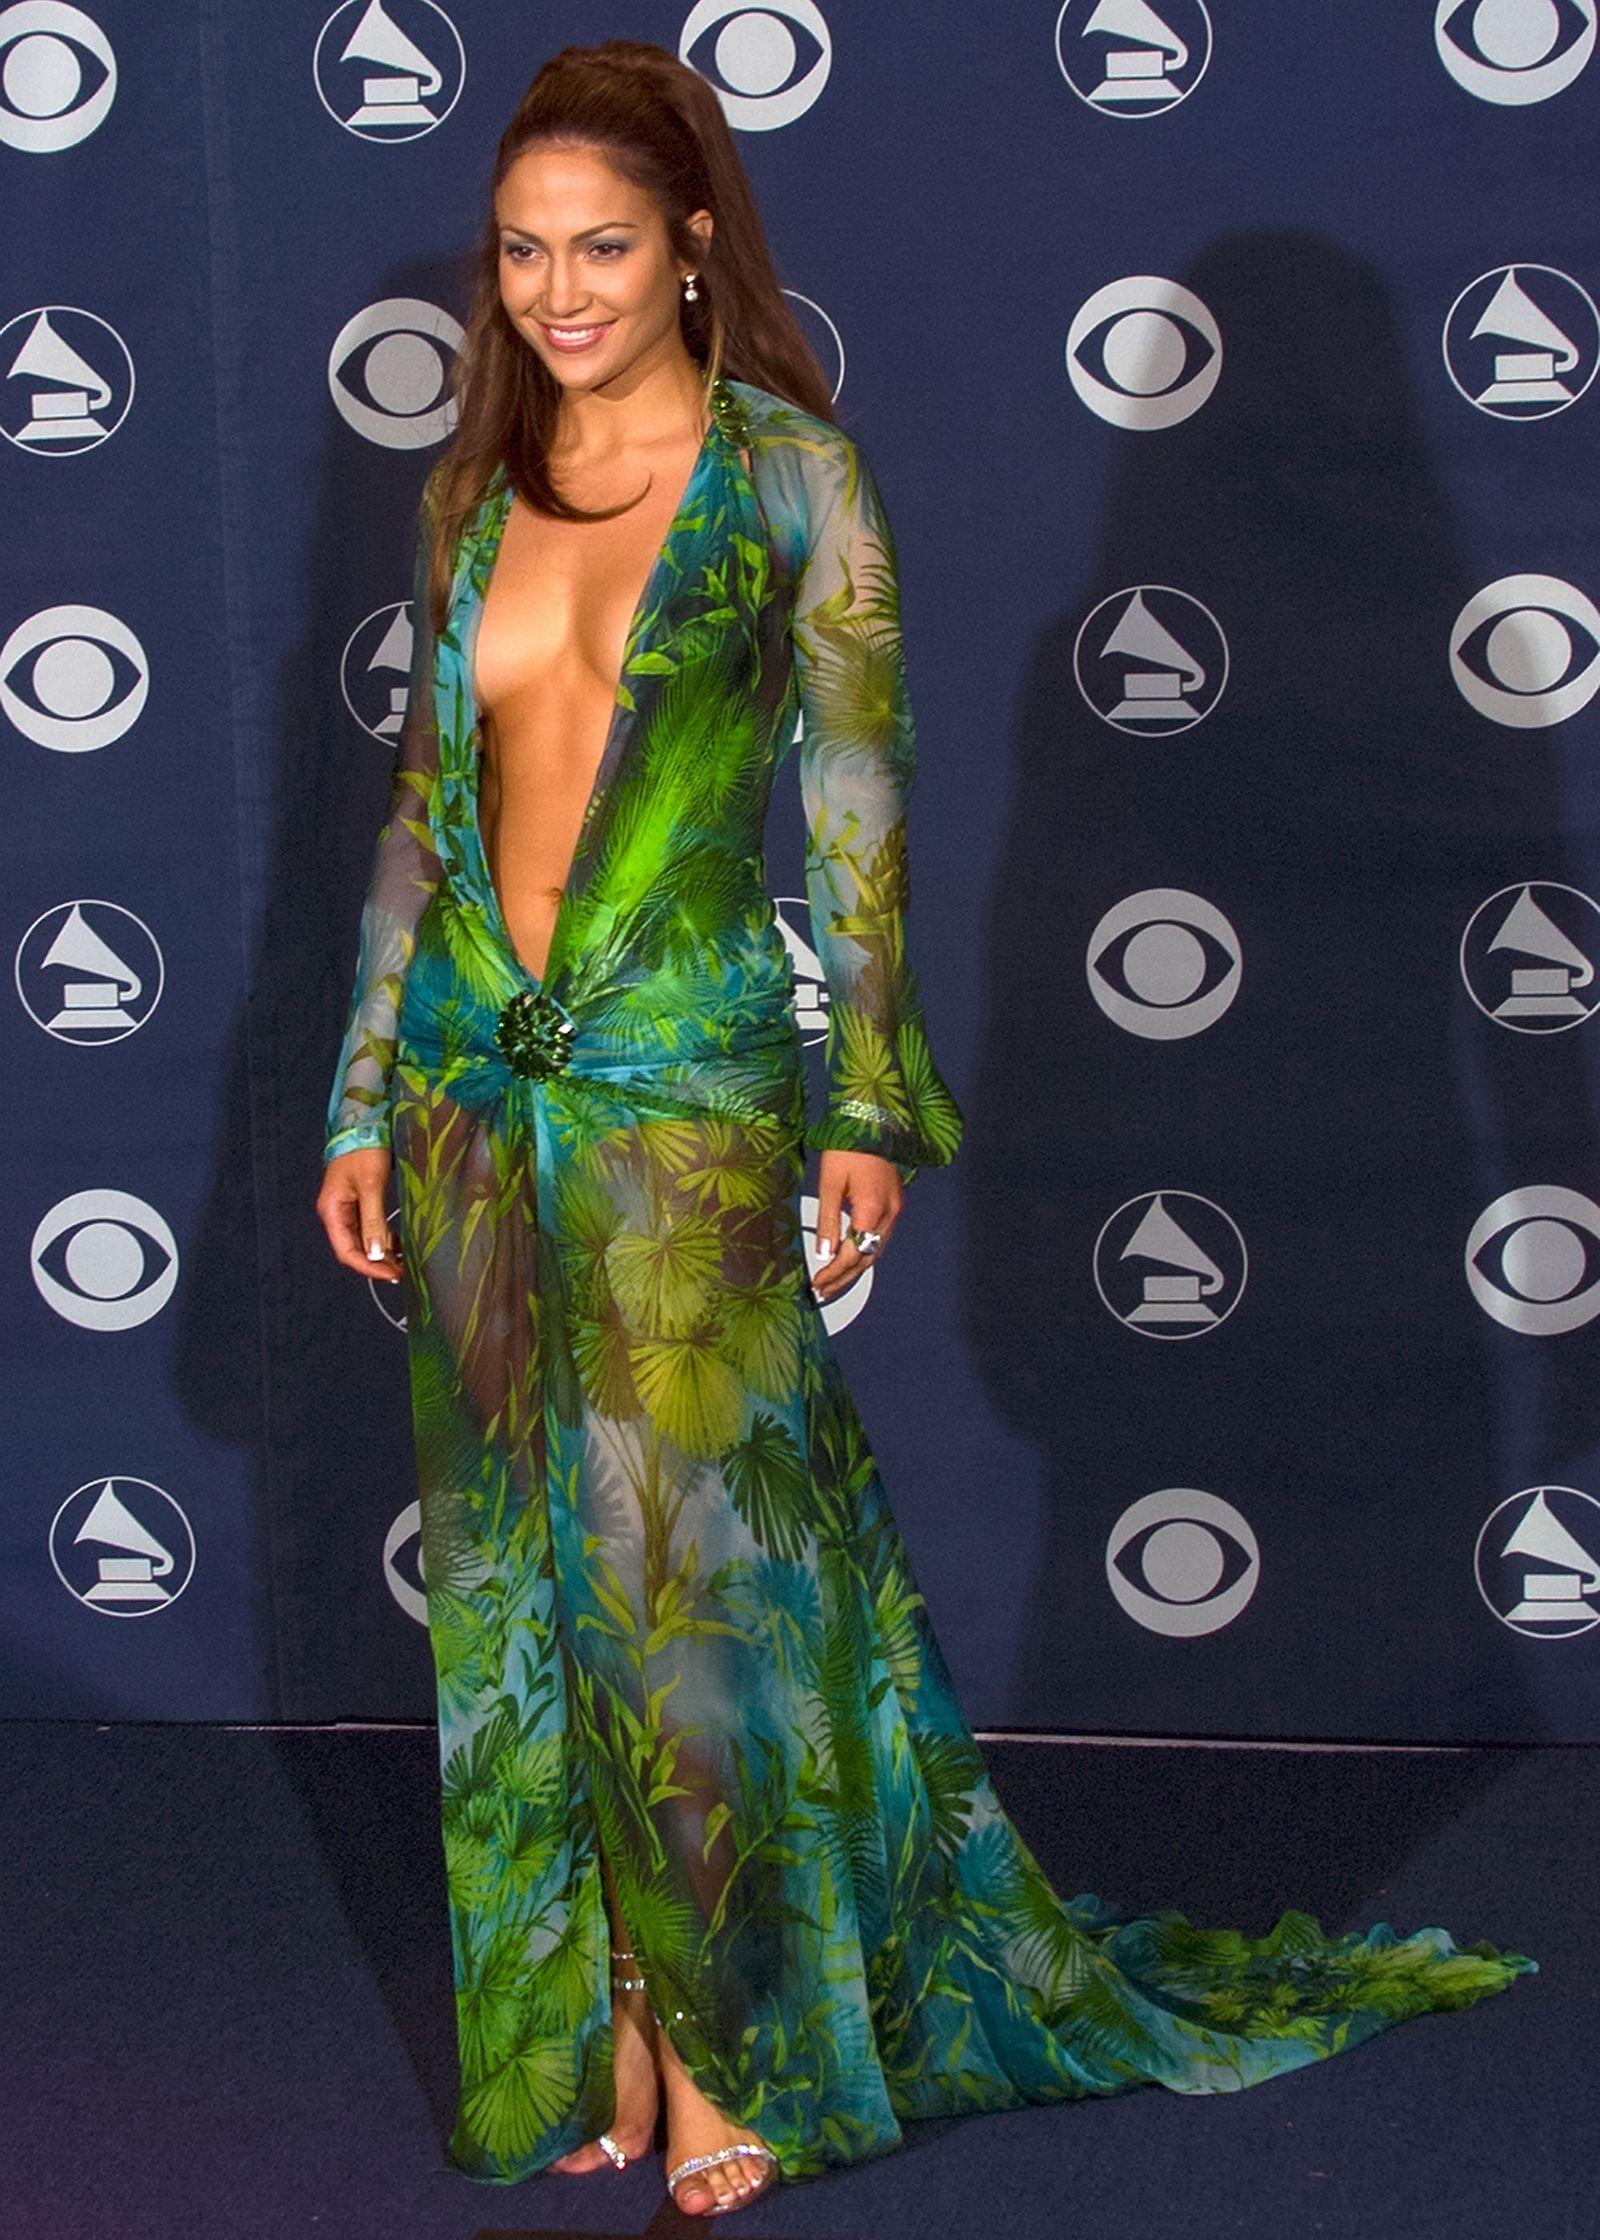 Versace Just Recreated Jennifer Lopez S Iconic Grammys Dress Grammy Dresses Jennifer Lopez Green Dress Iconic Dresses [ 2240 x 1600 Pixel ]